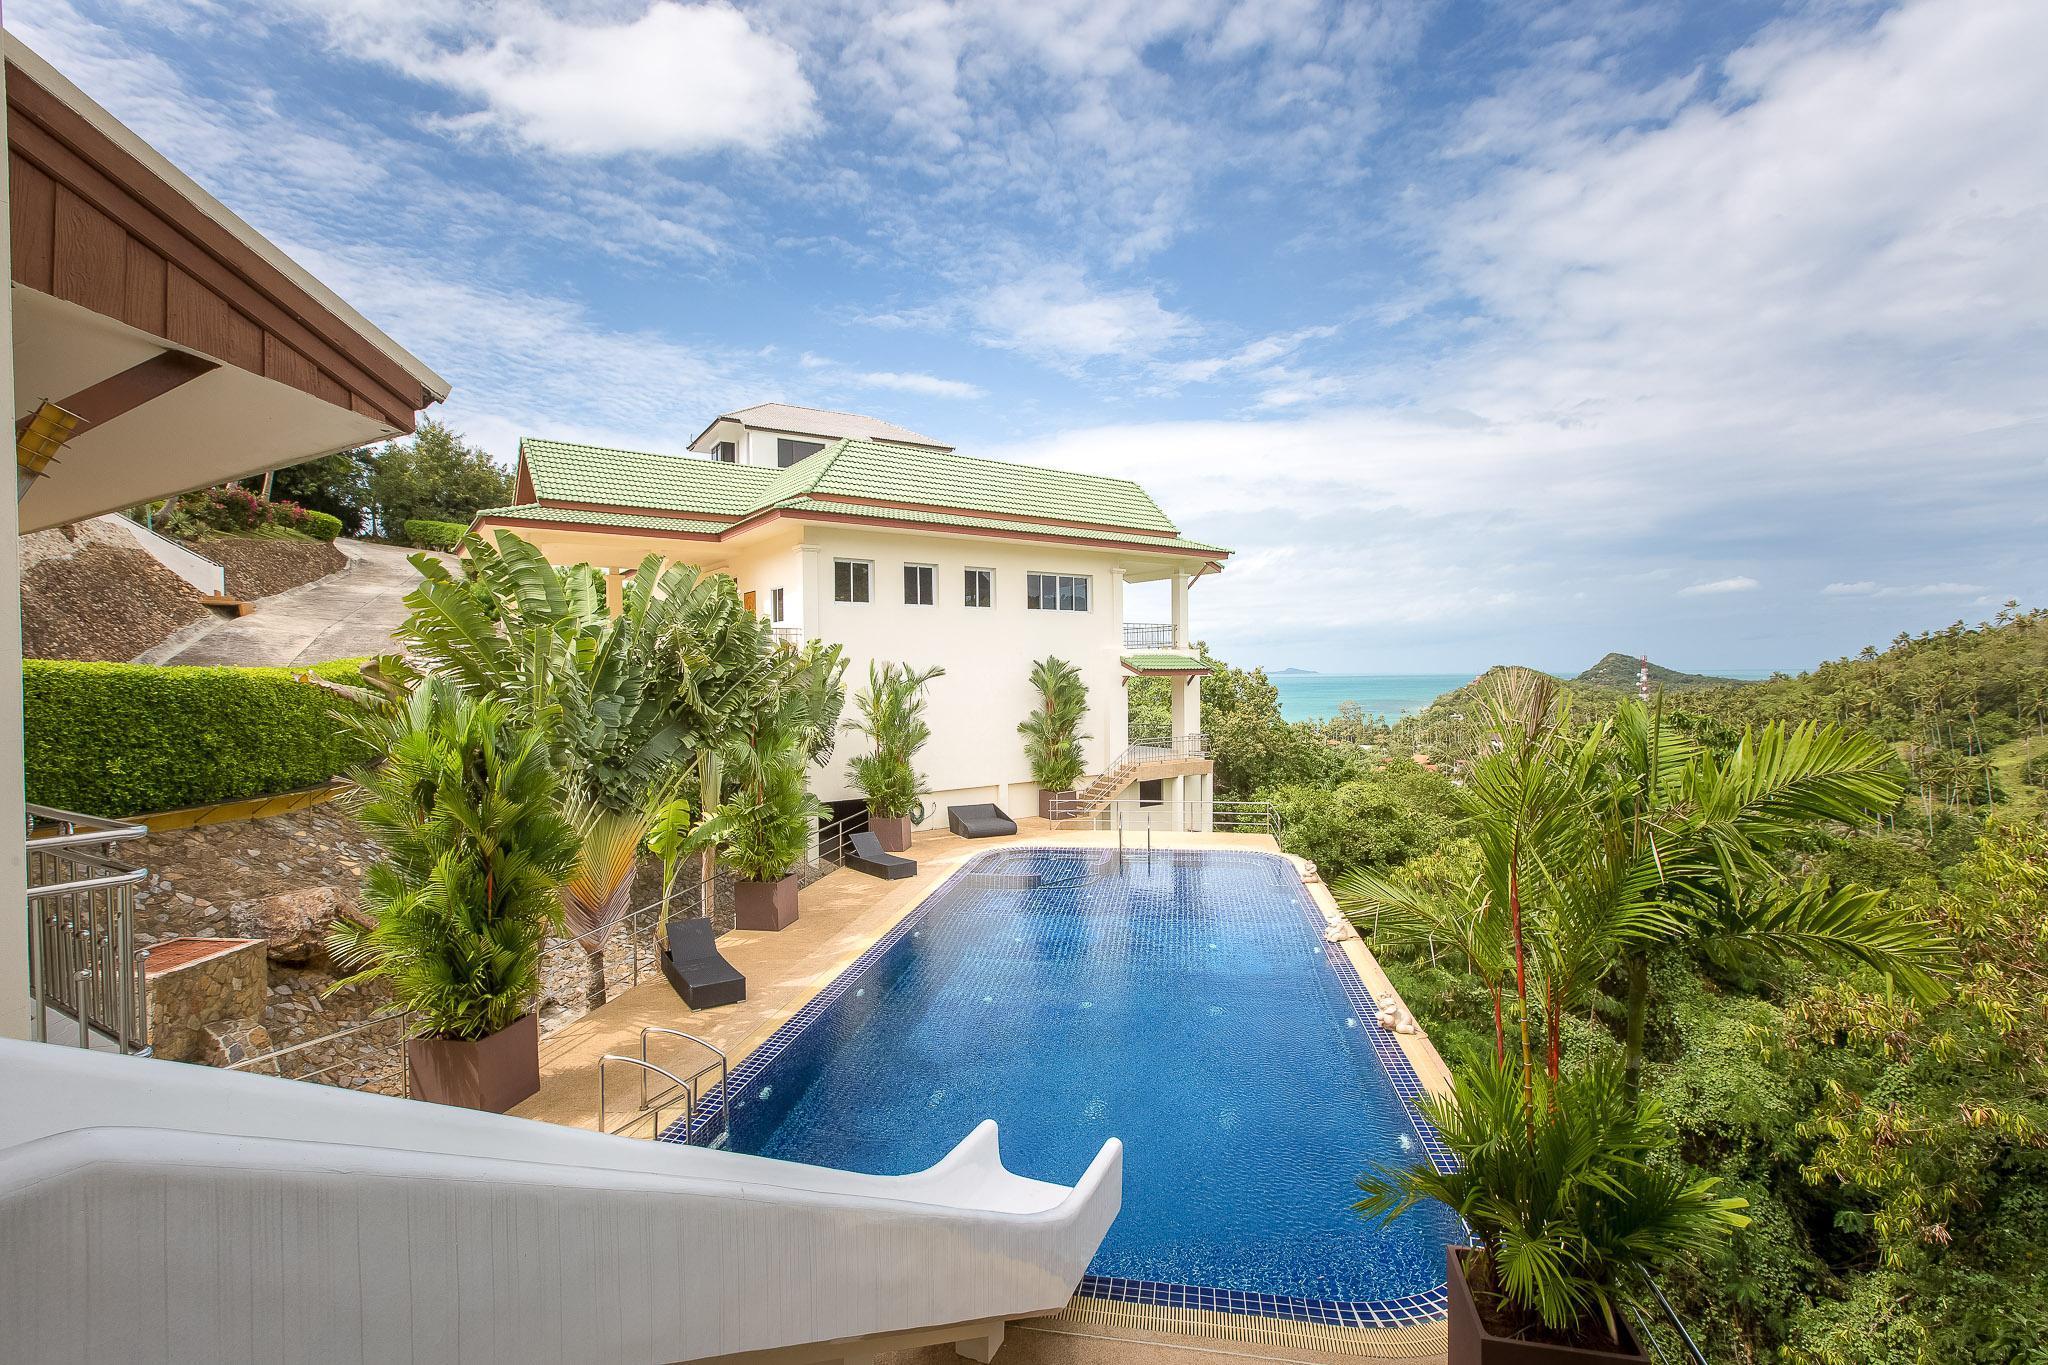 Villa Brussou Luxury 3BR Villa With Waterslide